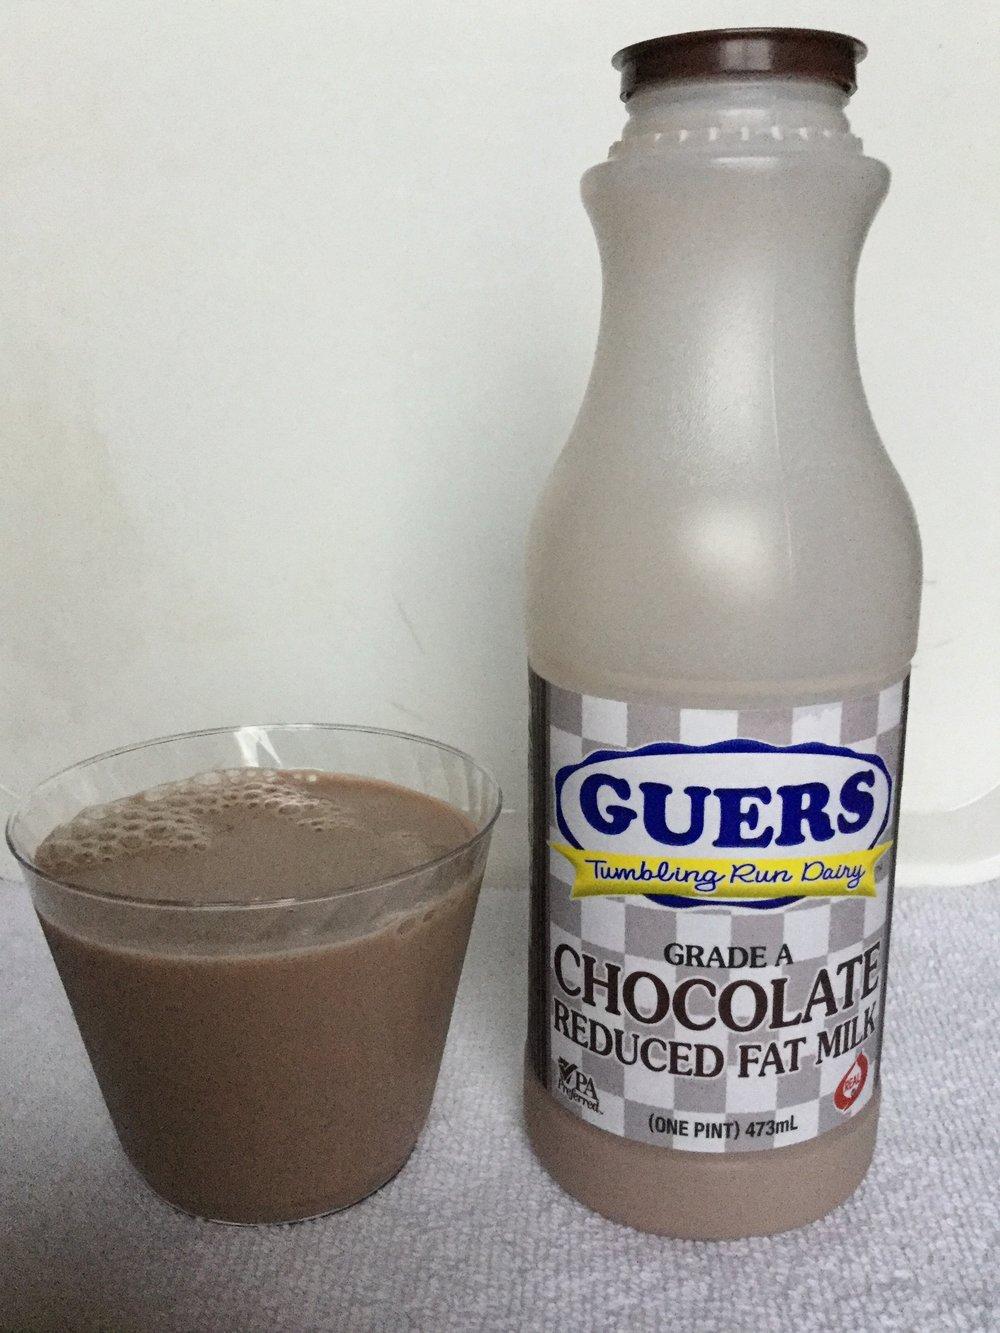 Guers Tumbling Run Dairy Chocolate Milk Cup